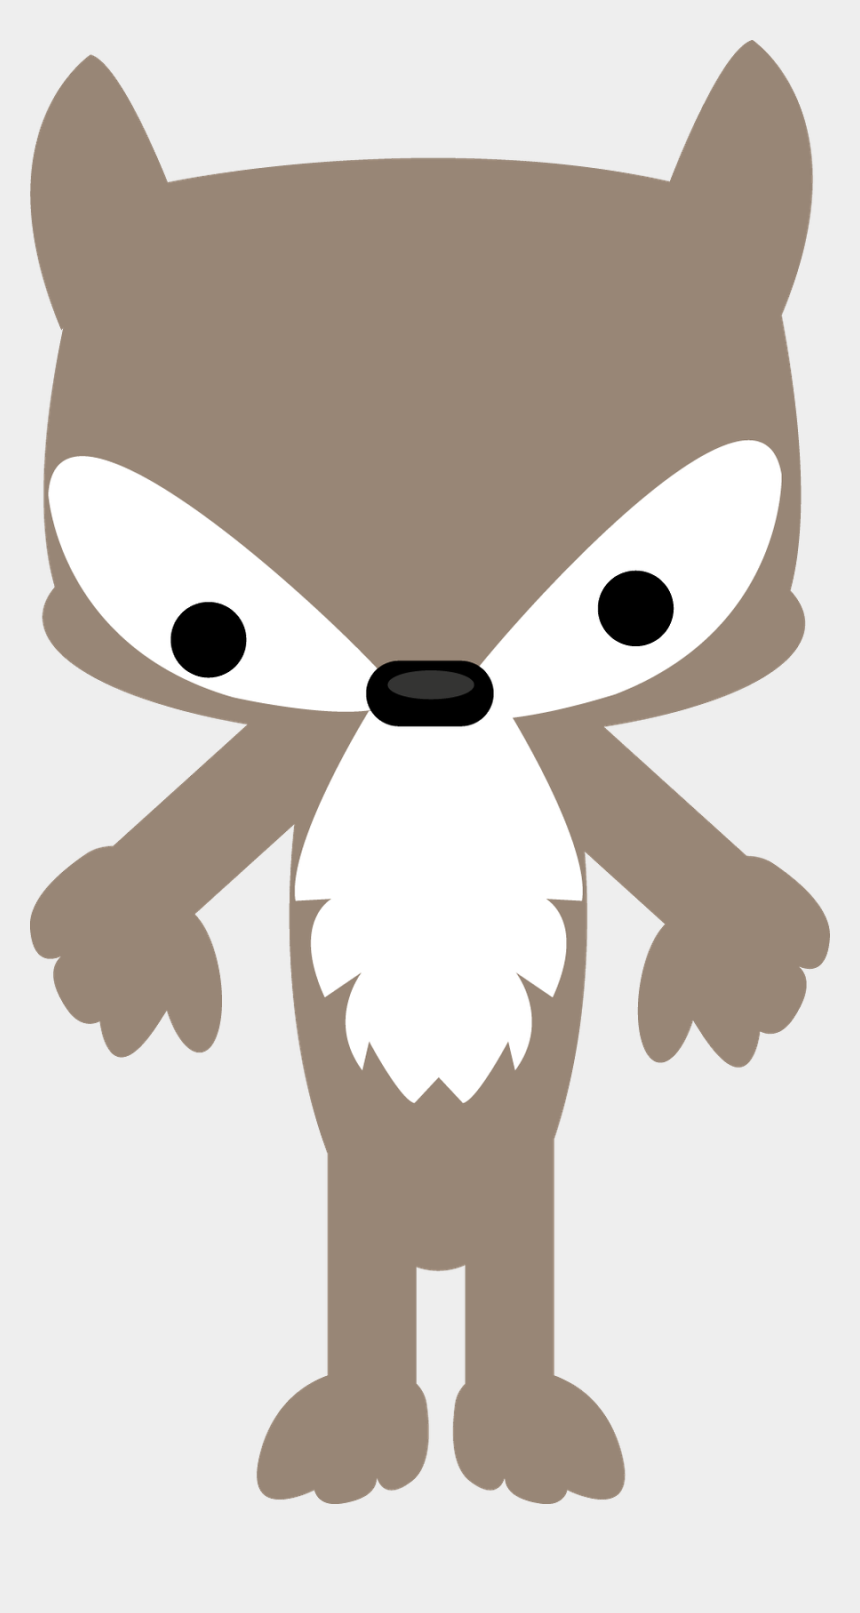 wolf clipart, Cartoons - Little Red Riding Hood Wolf Clipart - Cute Little Red Riding Hood Wolf